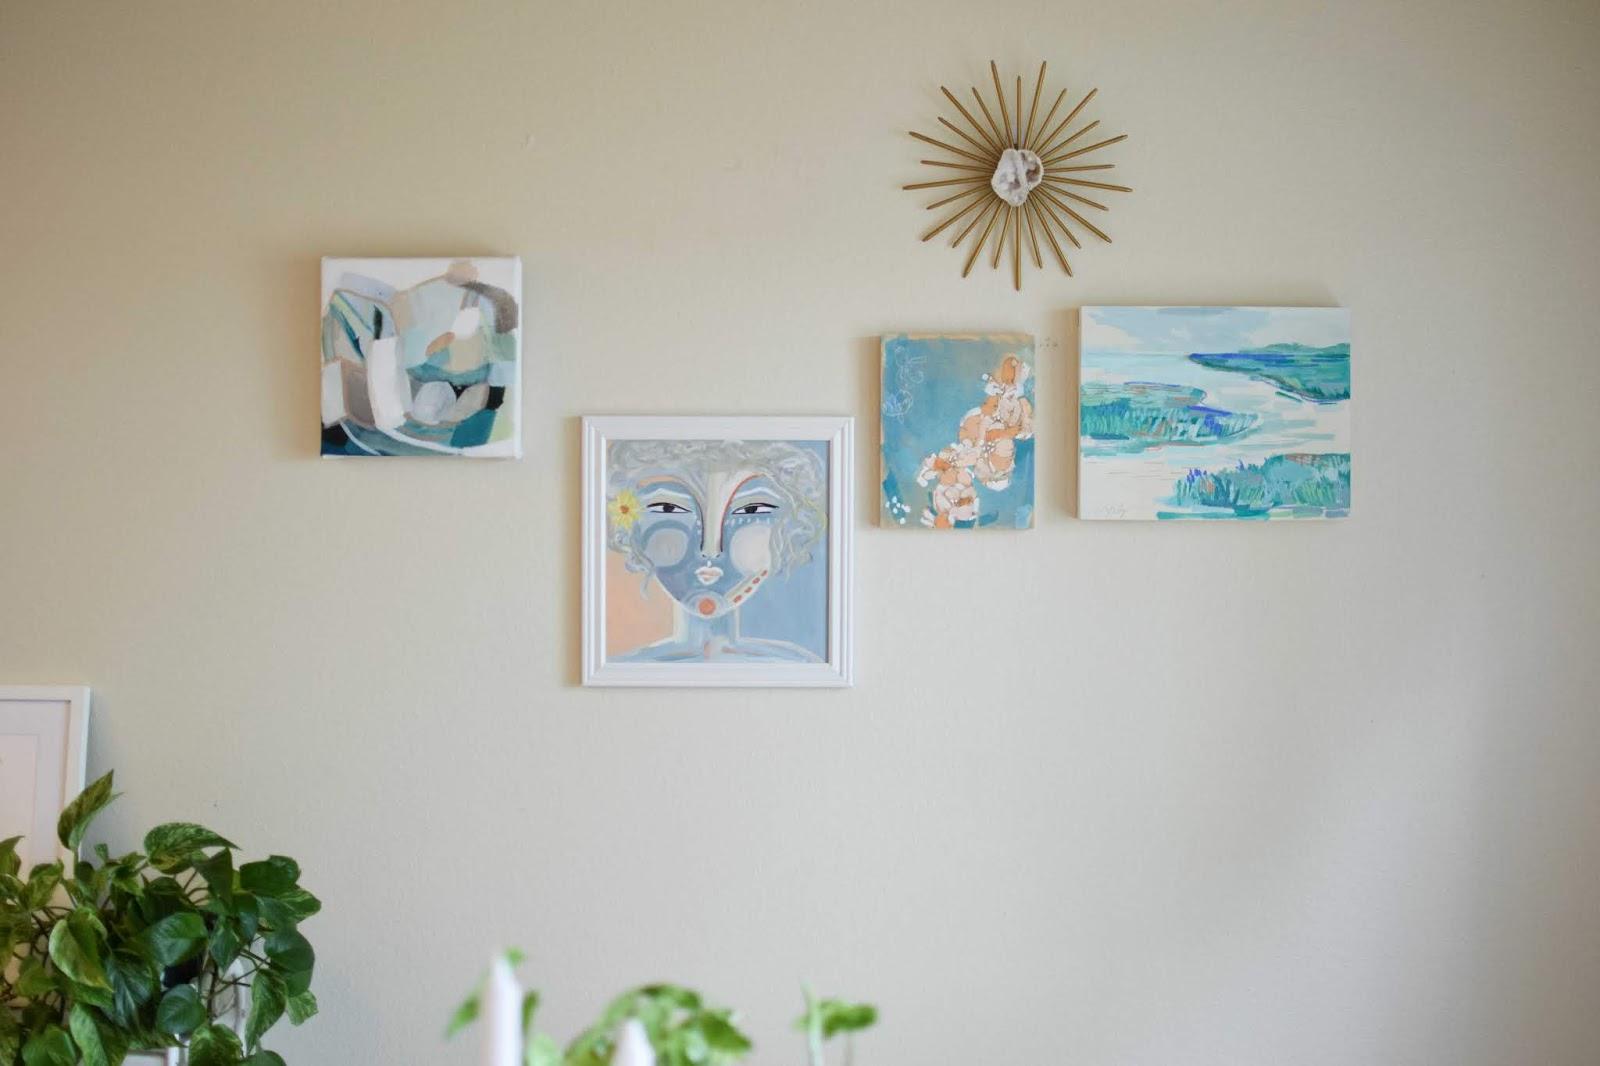 Gallery wall featuring original art